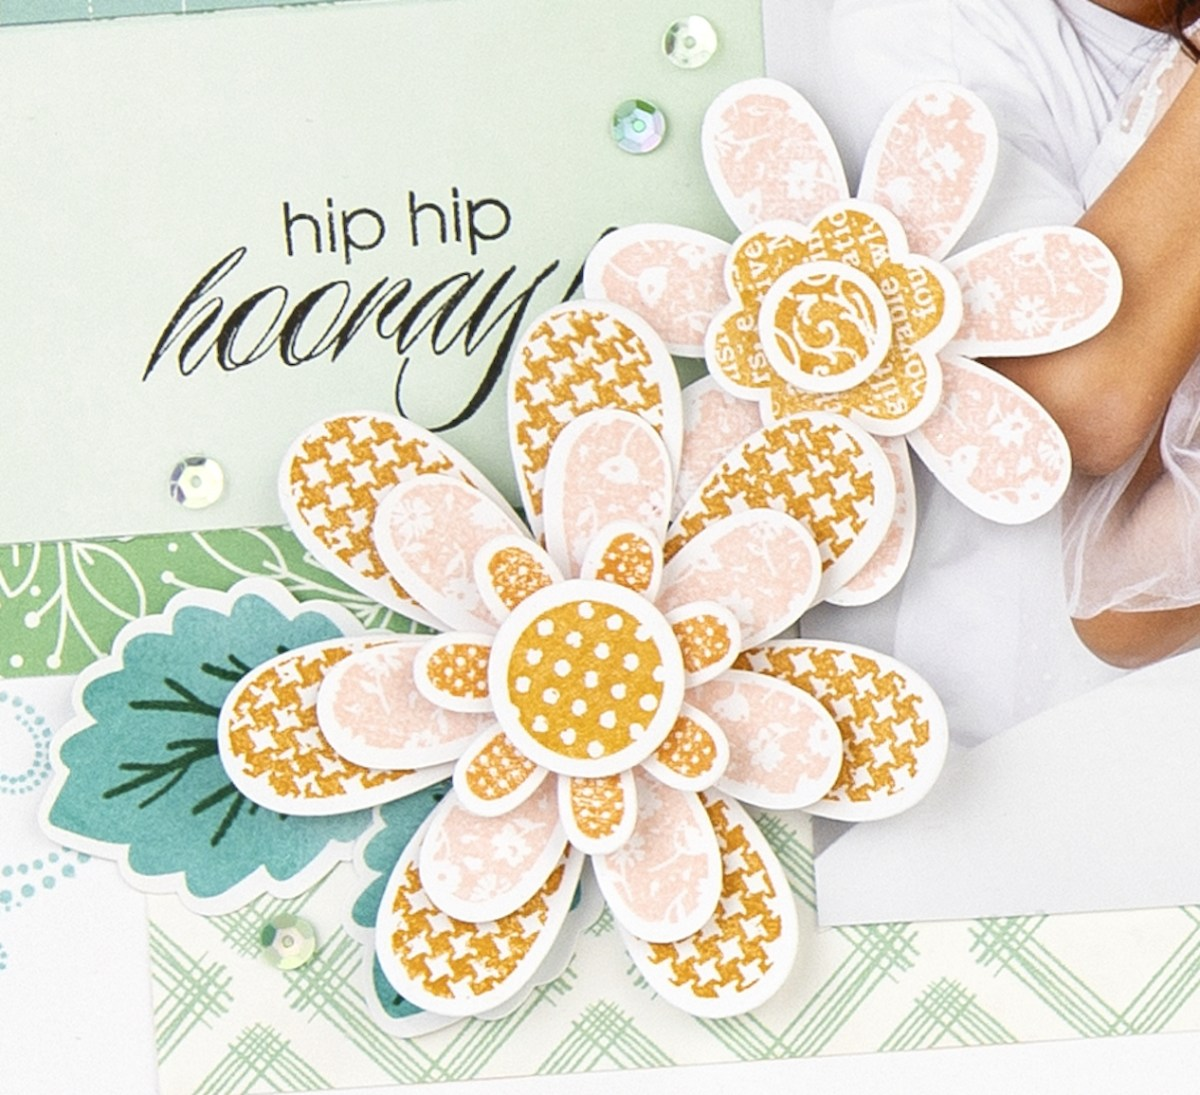 Stamptacular Sale #ctmh #closetomyheart #sale #stamps #diy #cardmaking #scrapbooking #papercrafting #stamptacular #myacrylix #thincuts #diecutting #cuttlebug #hooraybouquet #hiphiphooray